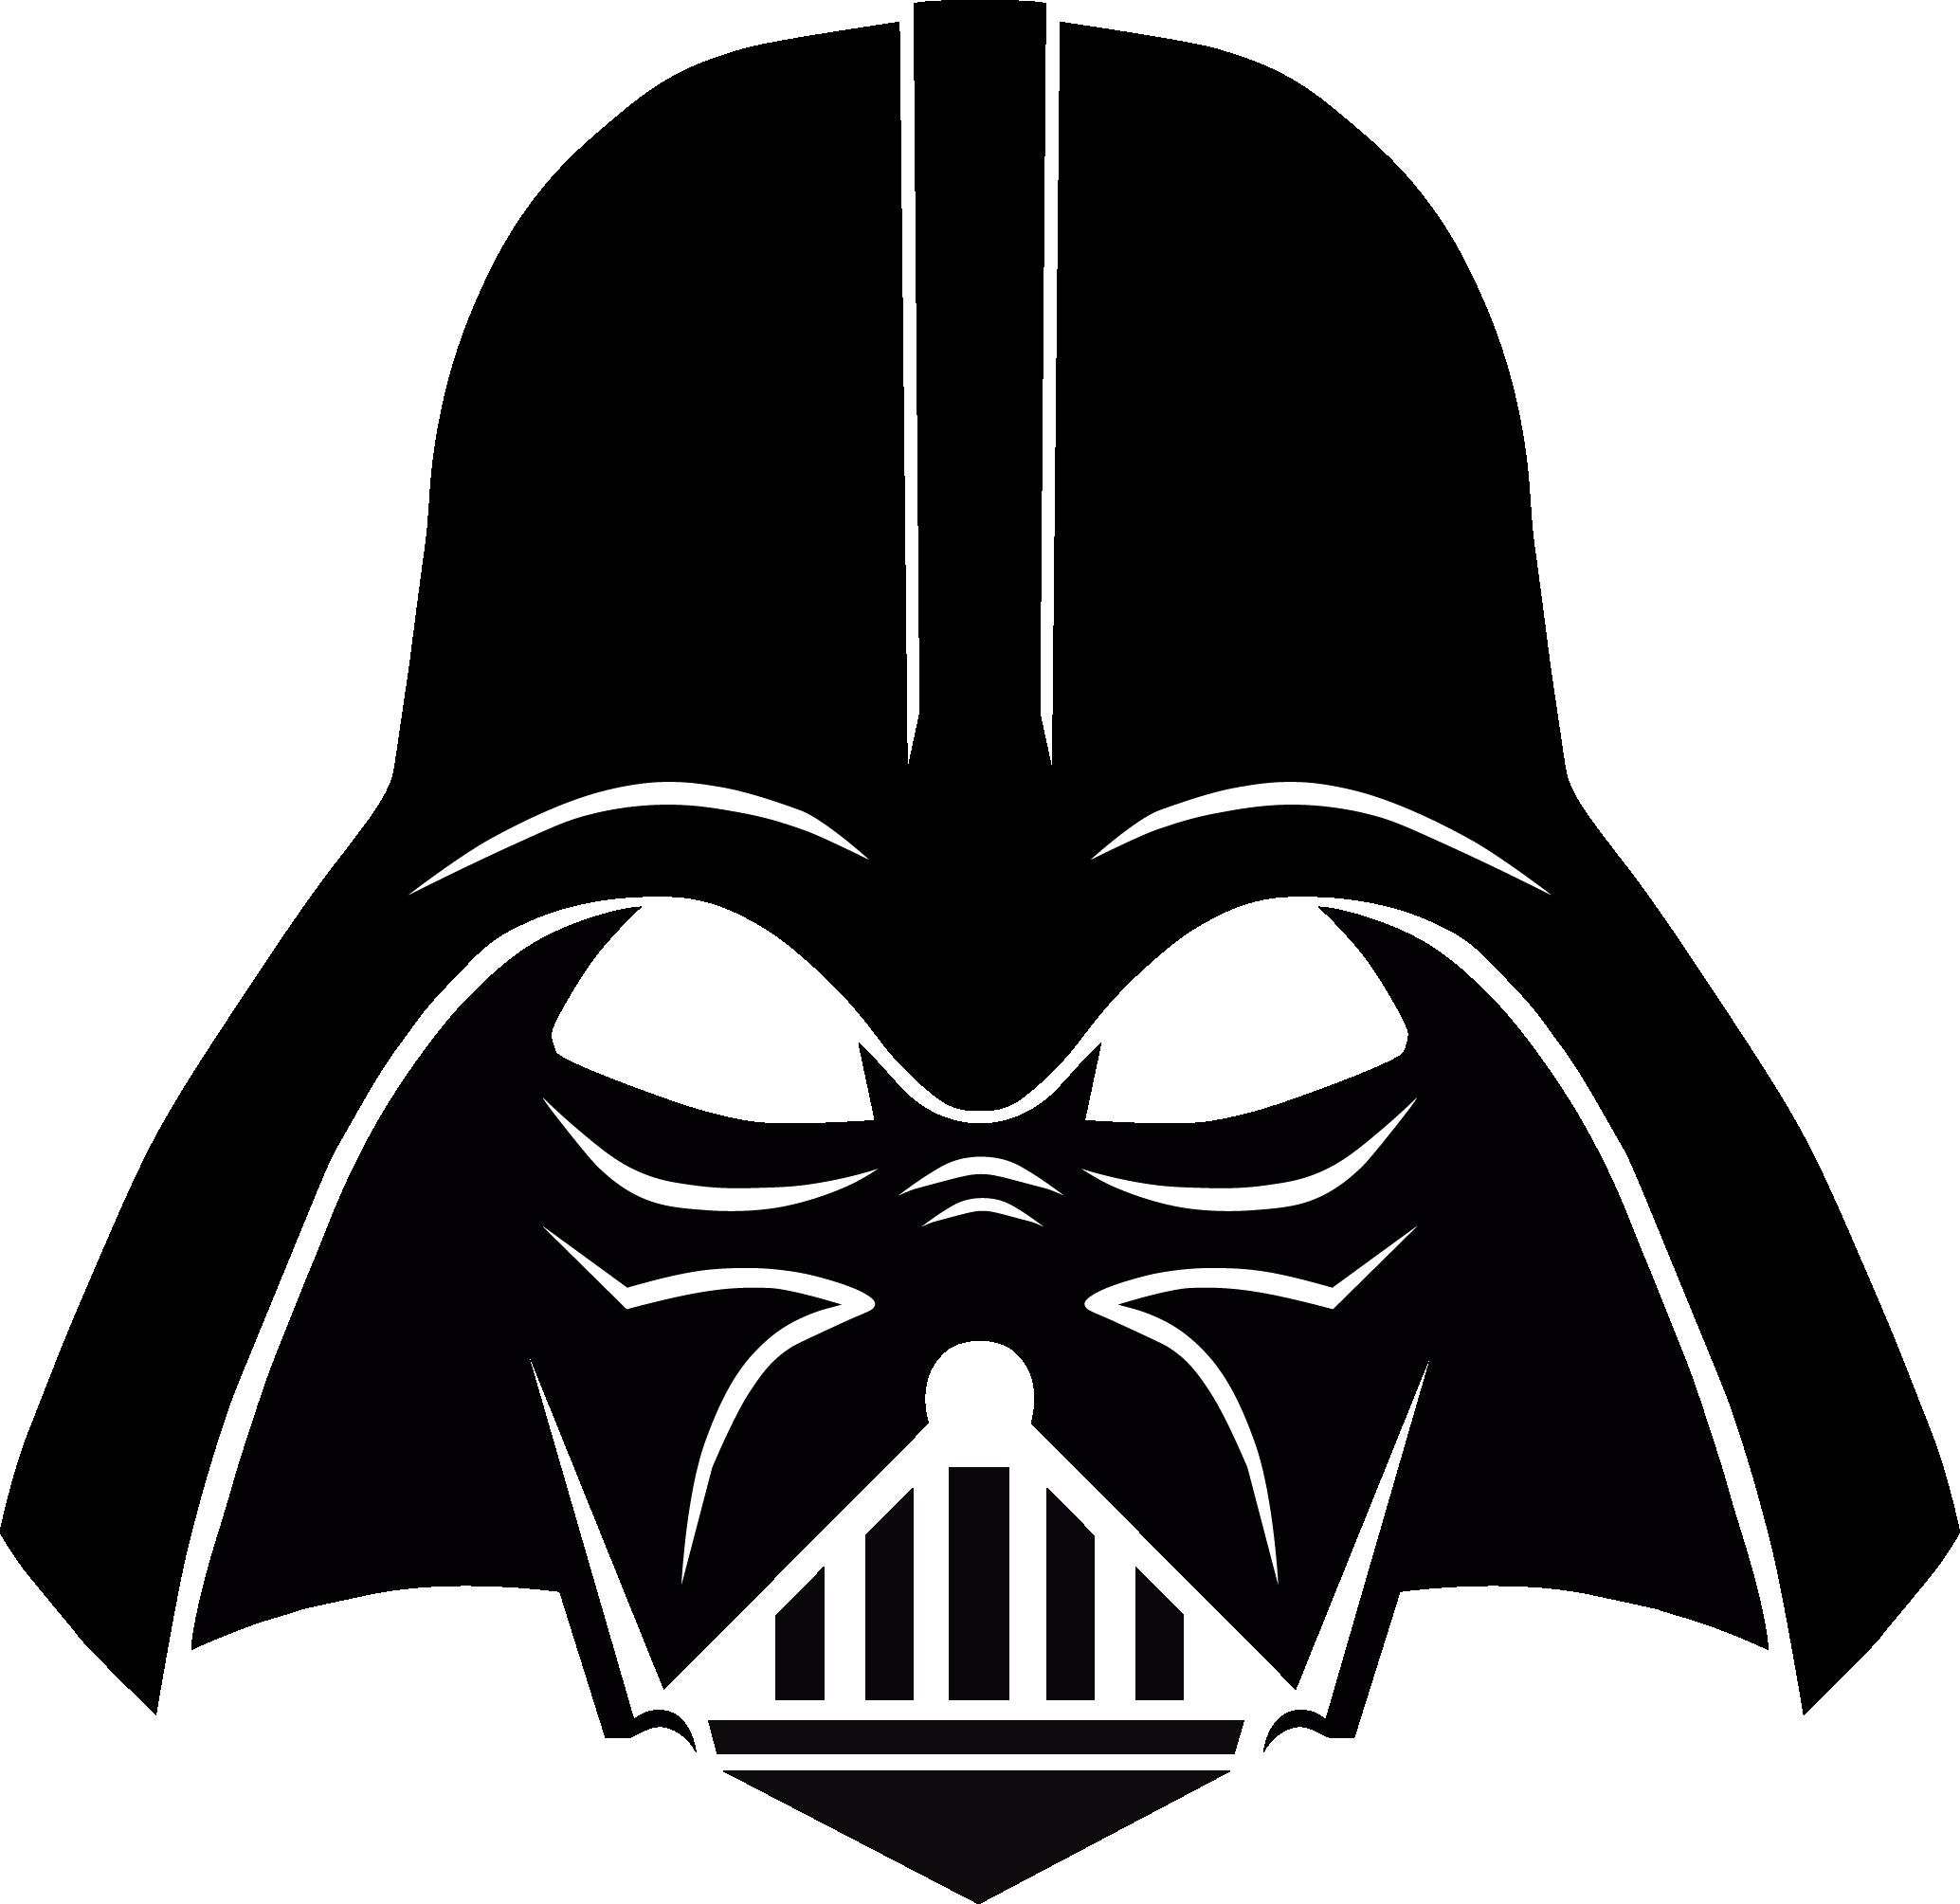 Darth Vader Stencil, free download The Sewing Rabbit